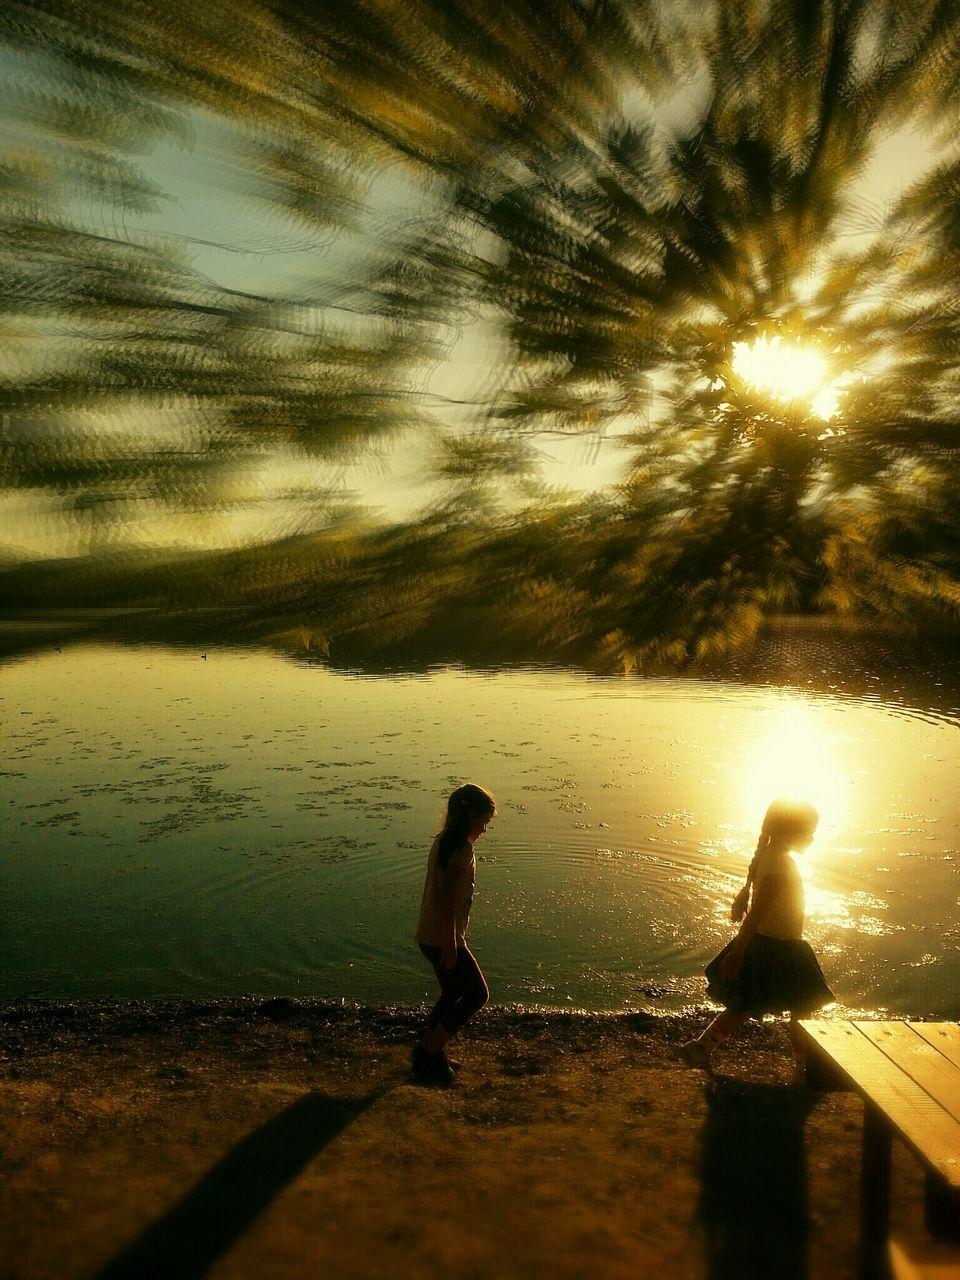 water, full length, sunset, silhouette, lifestyles, leisure activity, sunlight, reflection, beach, sea, sun, sky, walking, pier, standing, men, nature, shore